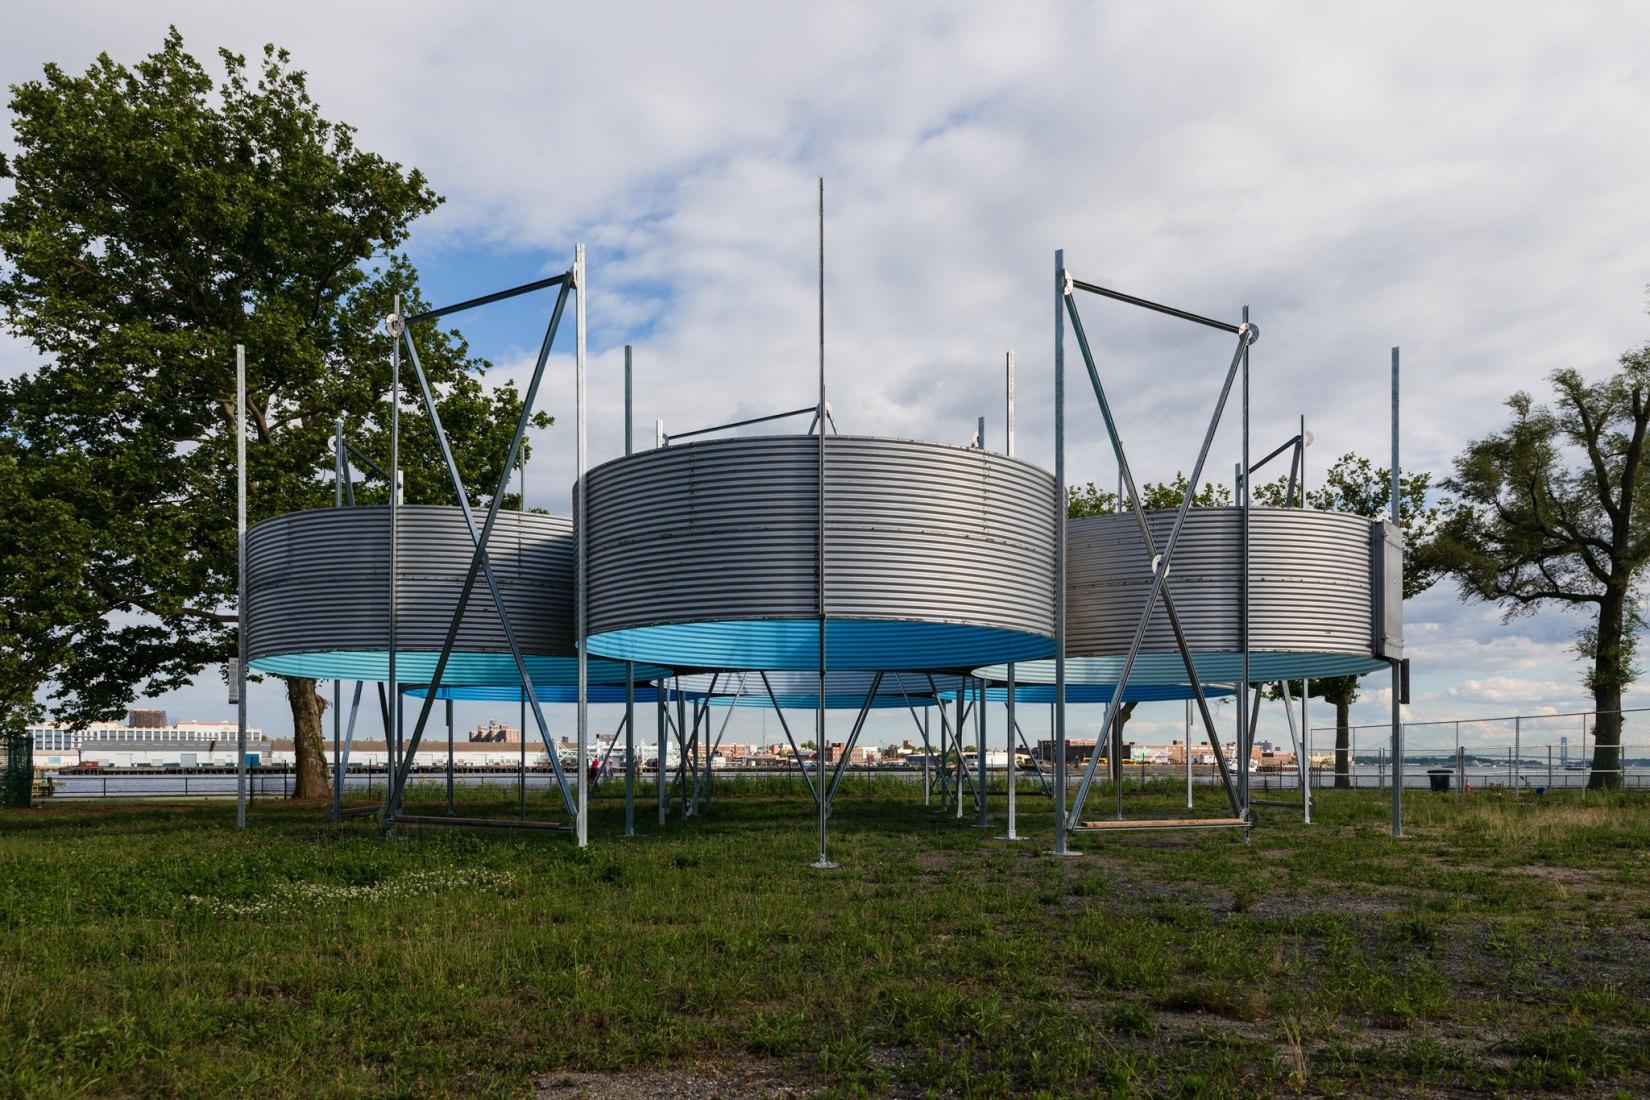 Instalación de arte Oculi en Governors Island. Fotografía por Zachary Taylor Newton